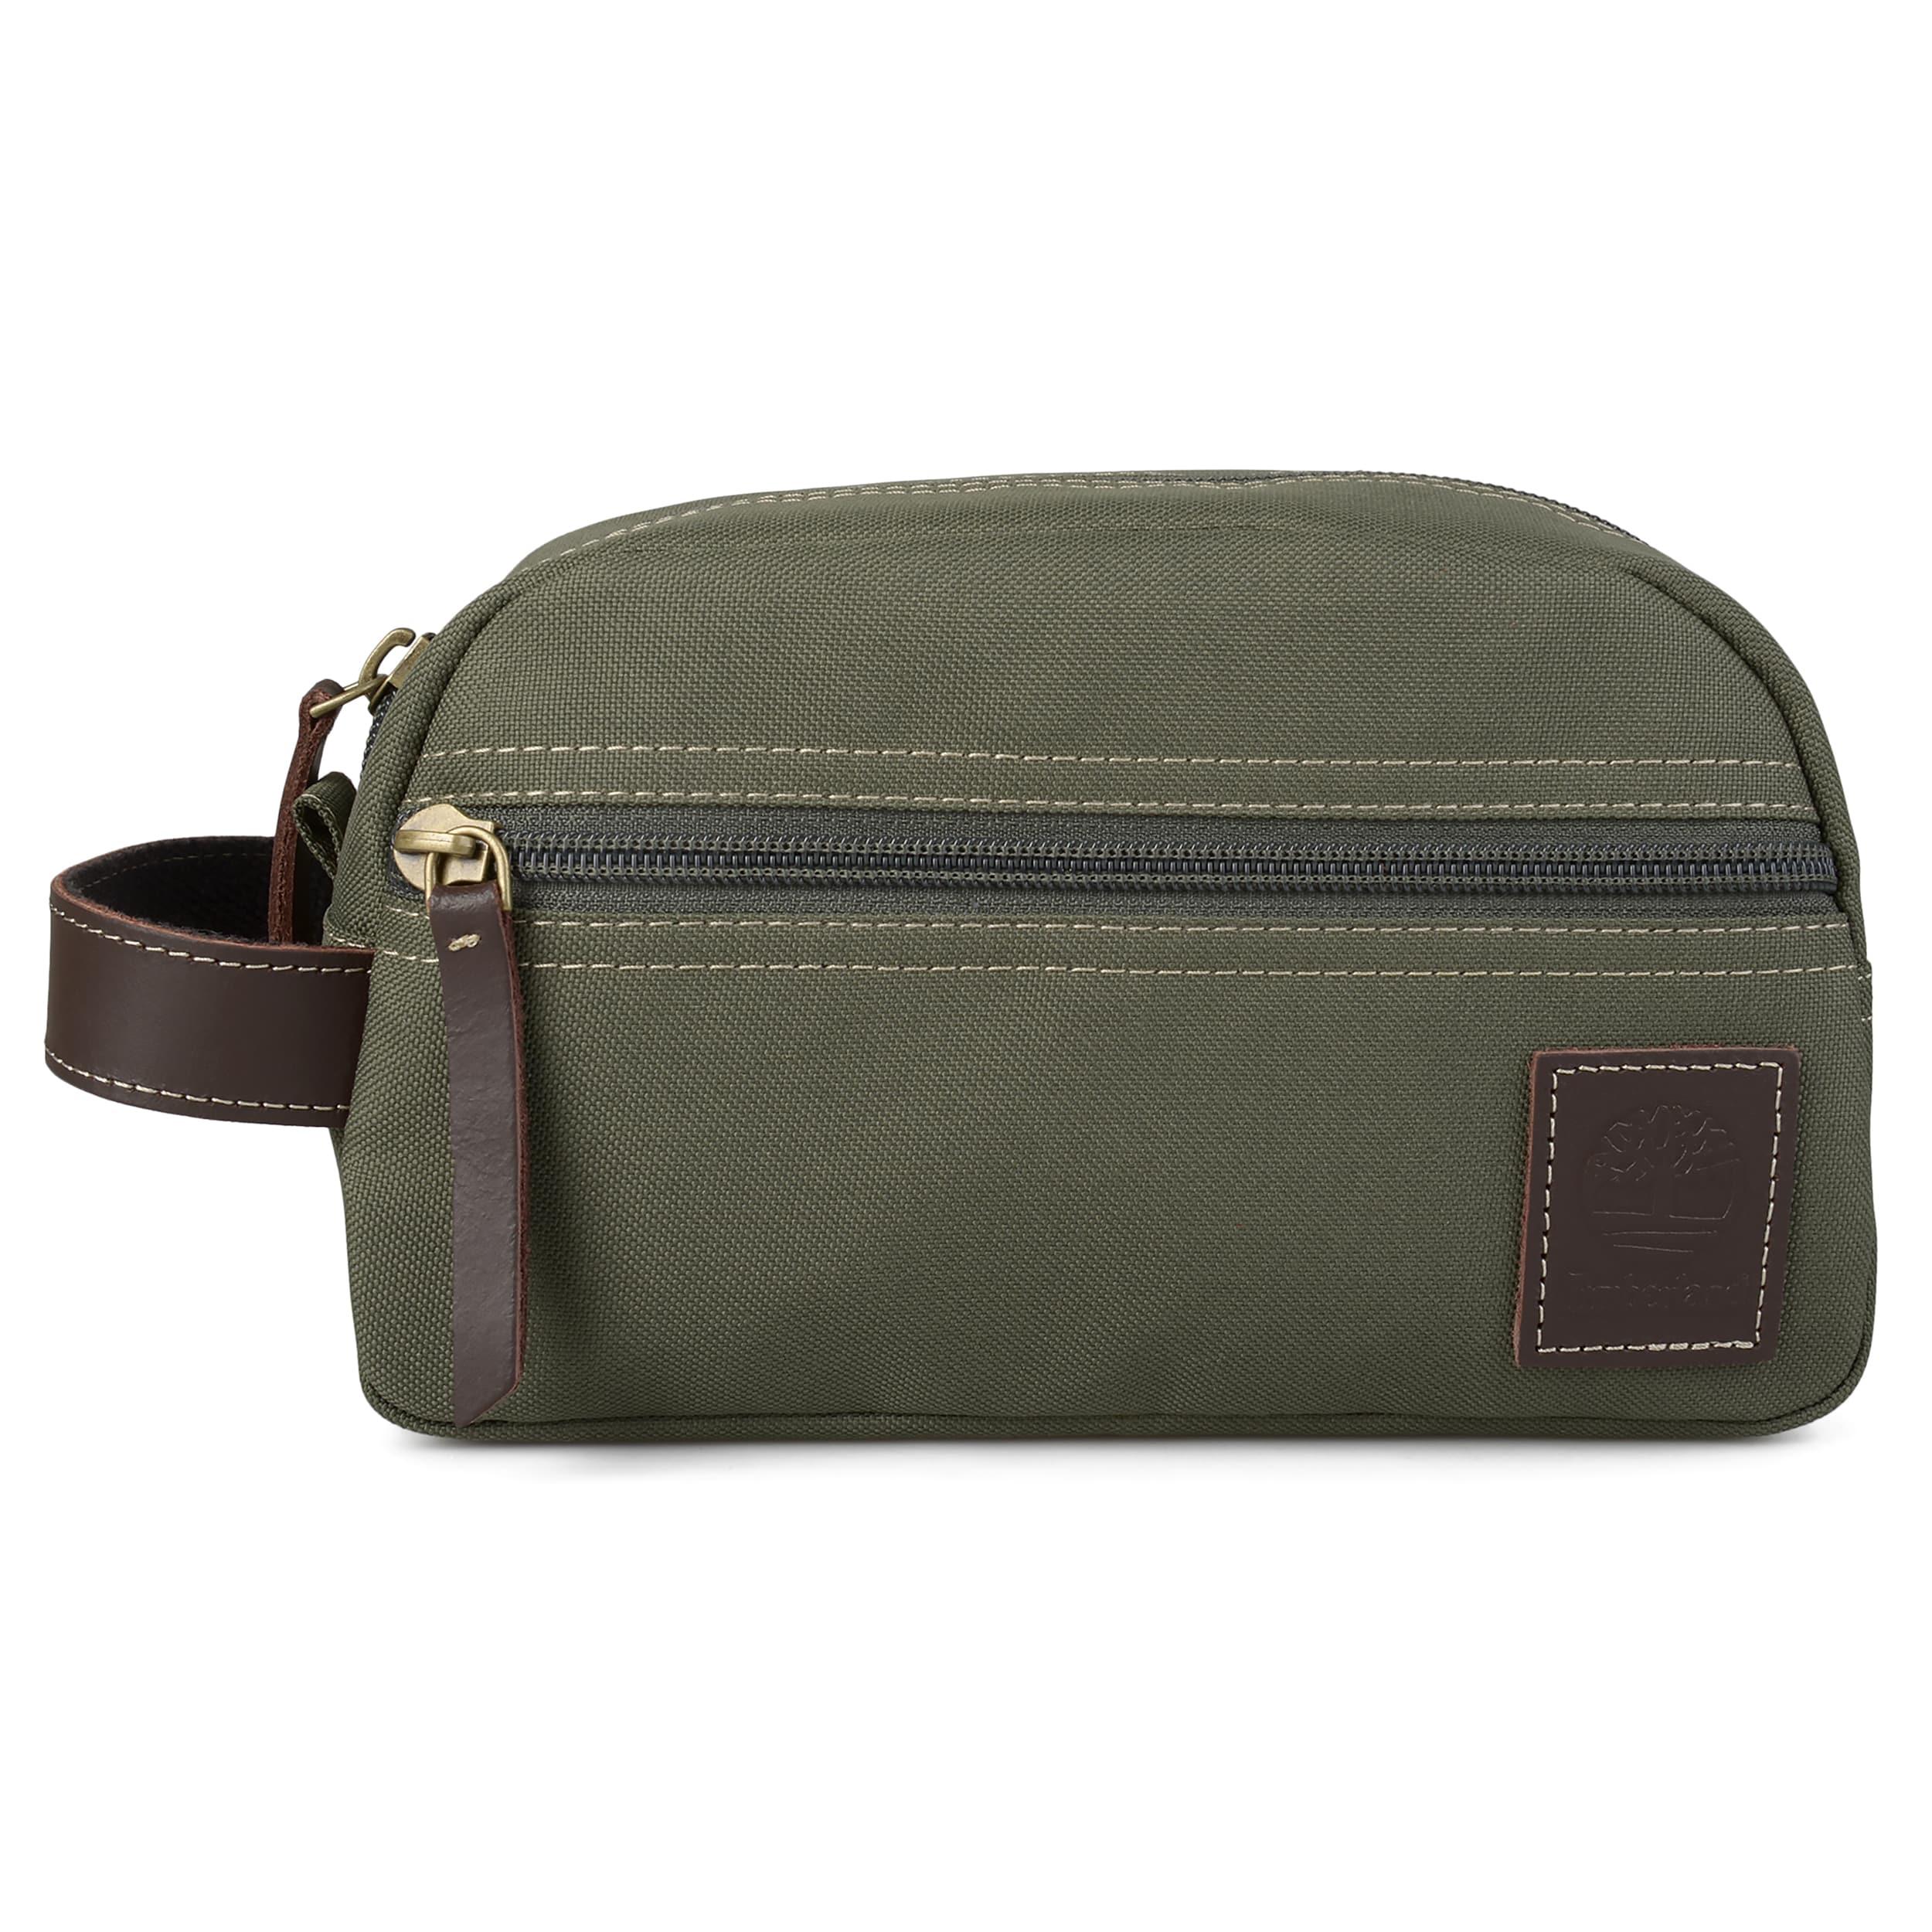 965909462bab Shop Timberland Men s Canvas Zipper Classic Travel Kit - Free ...